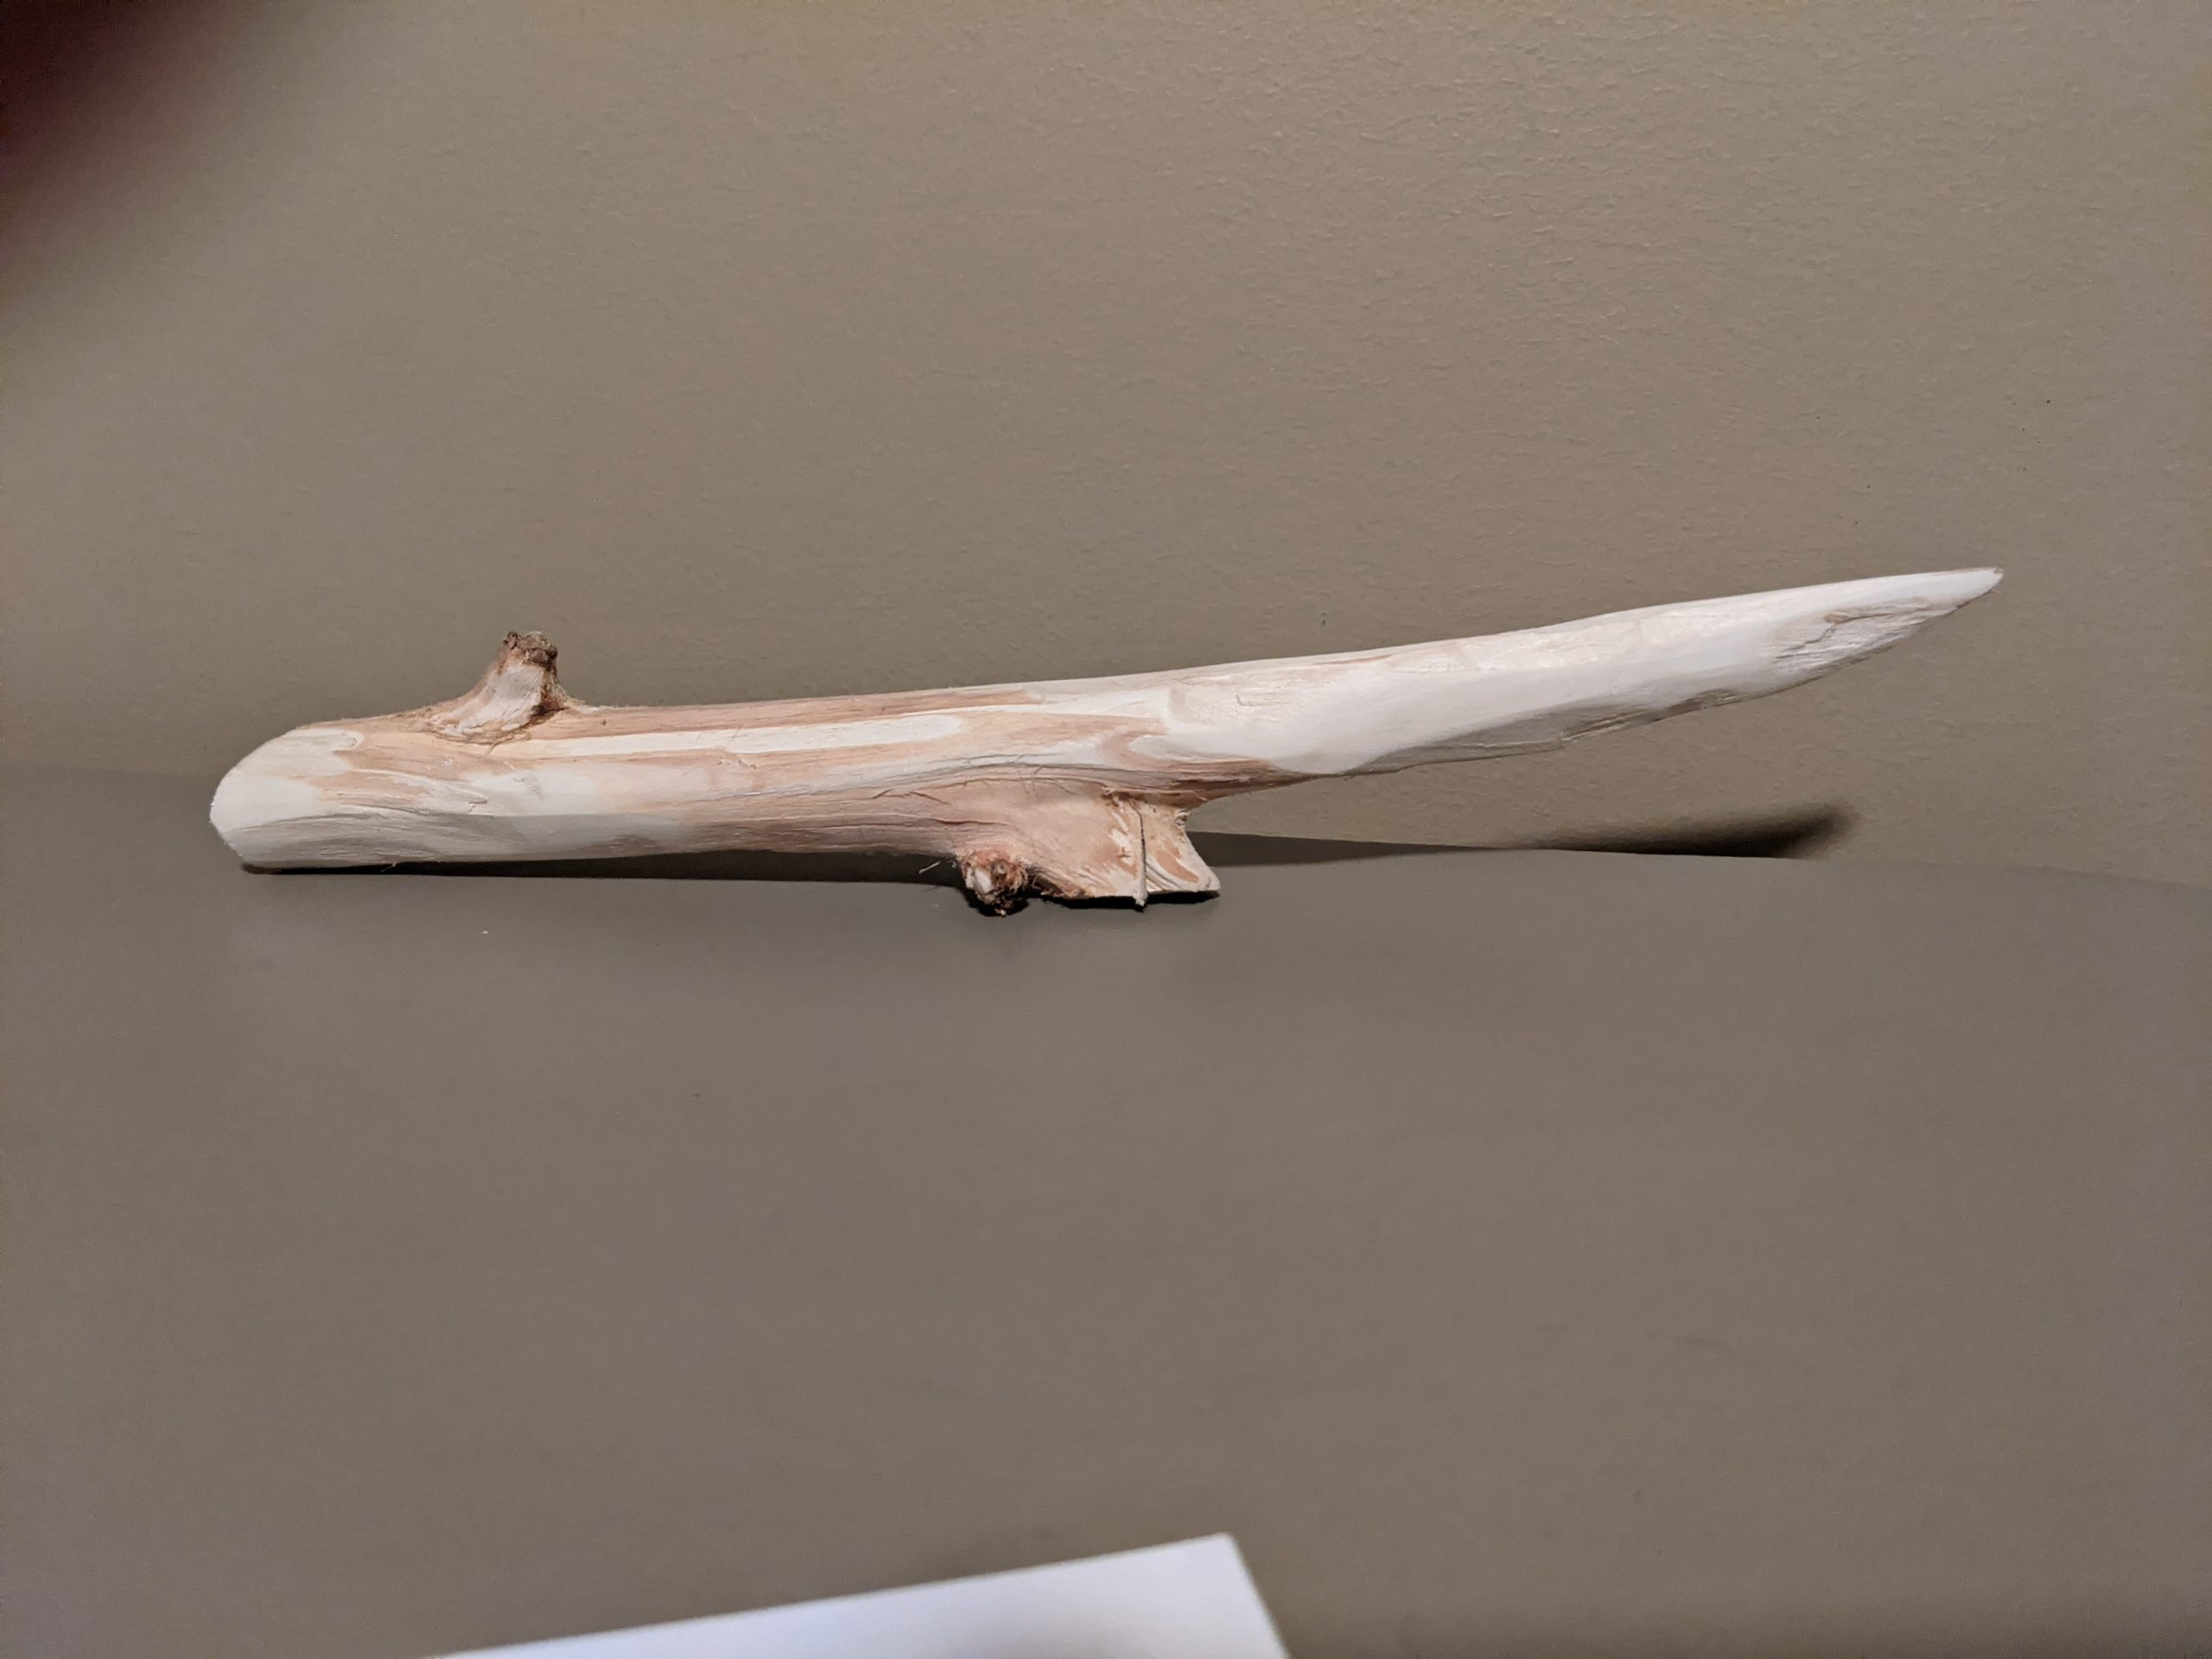 YAC 2020 #70 5-8 Knife Carving